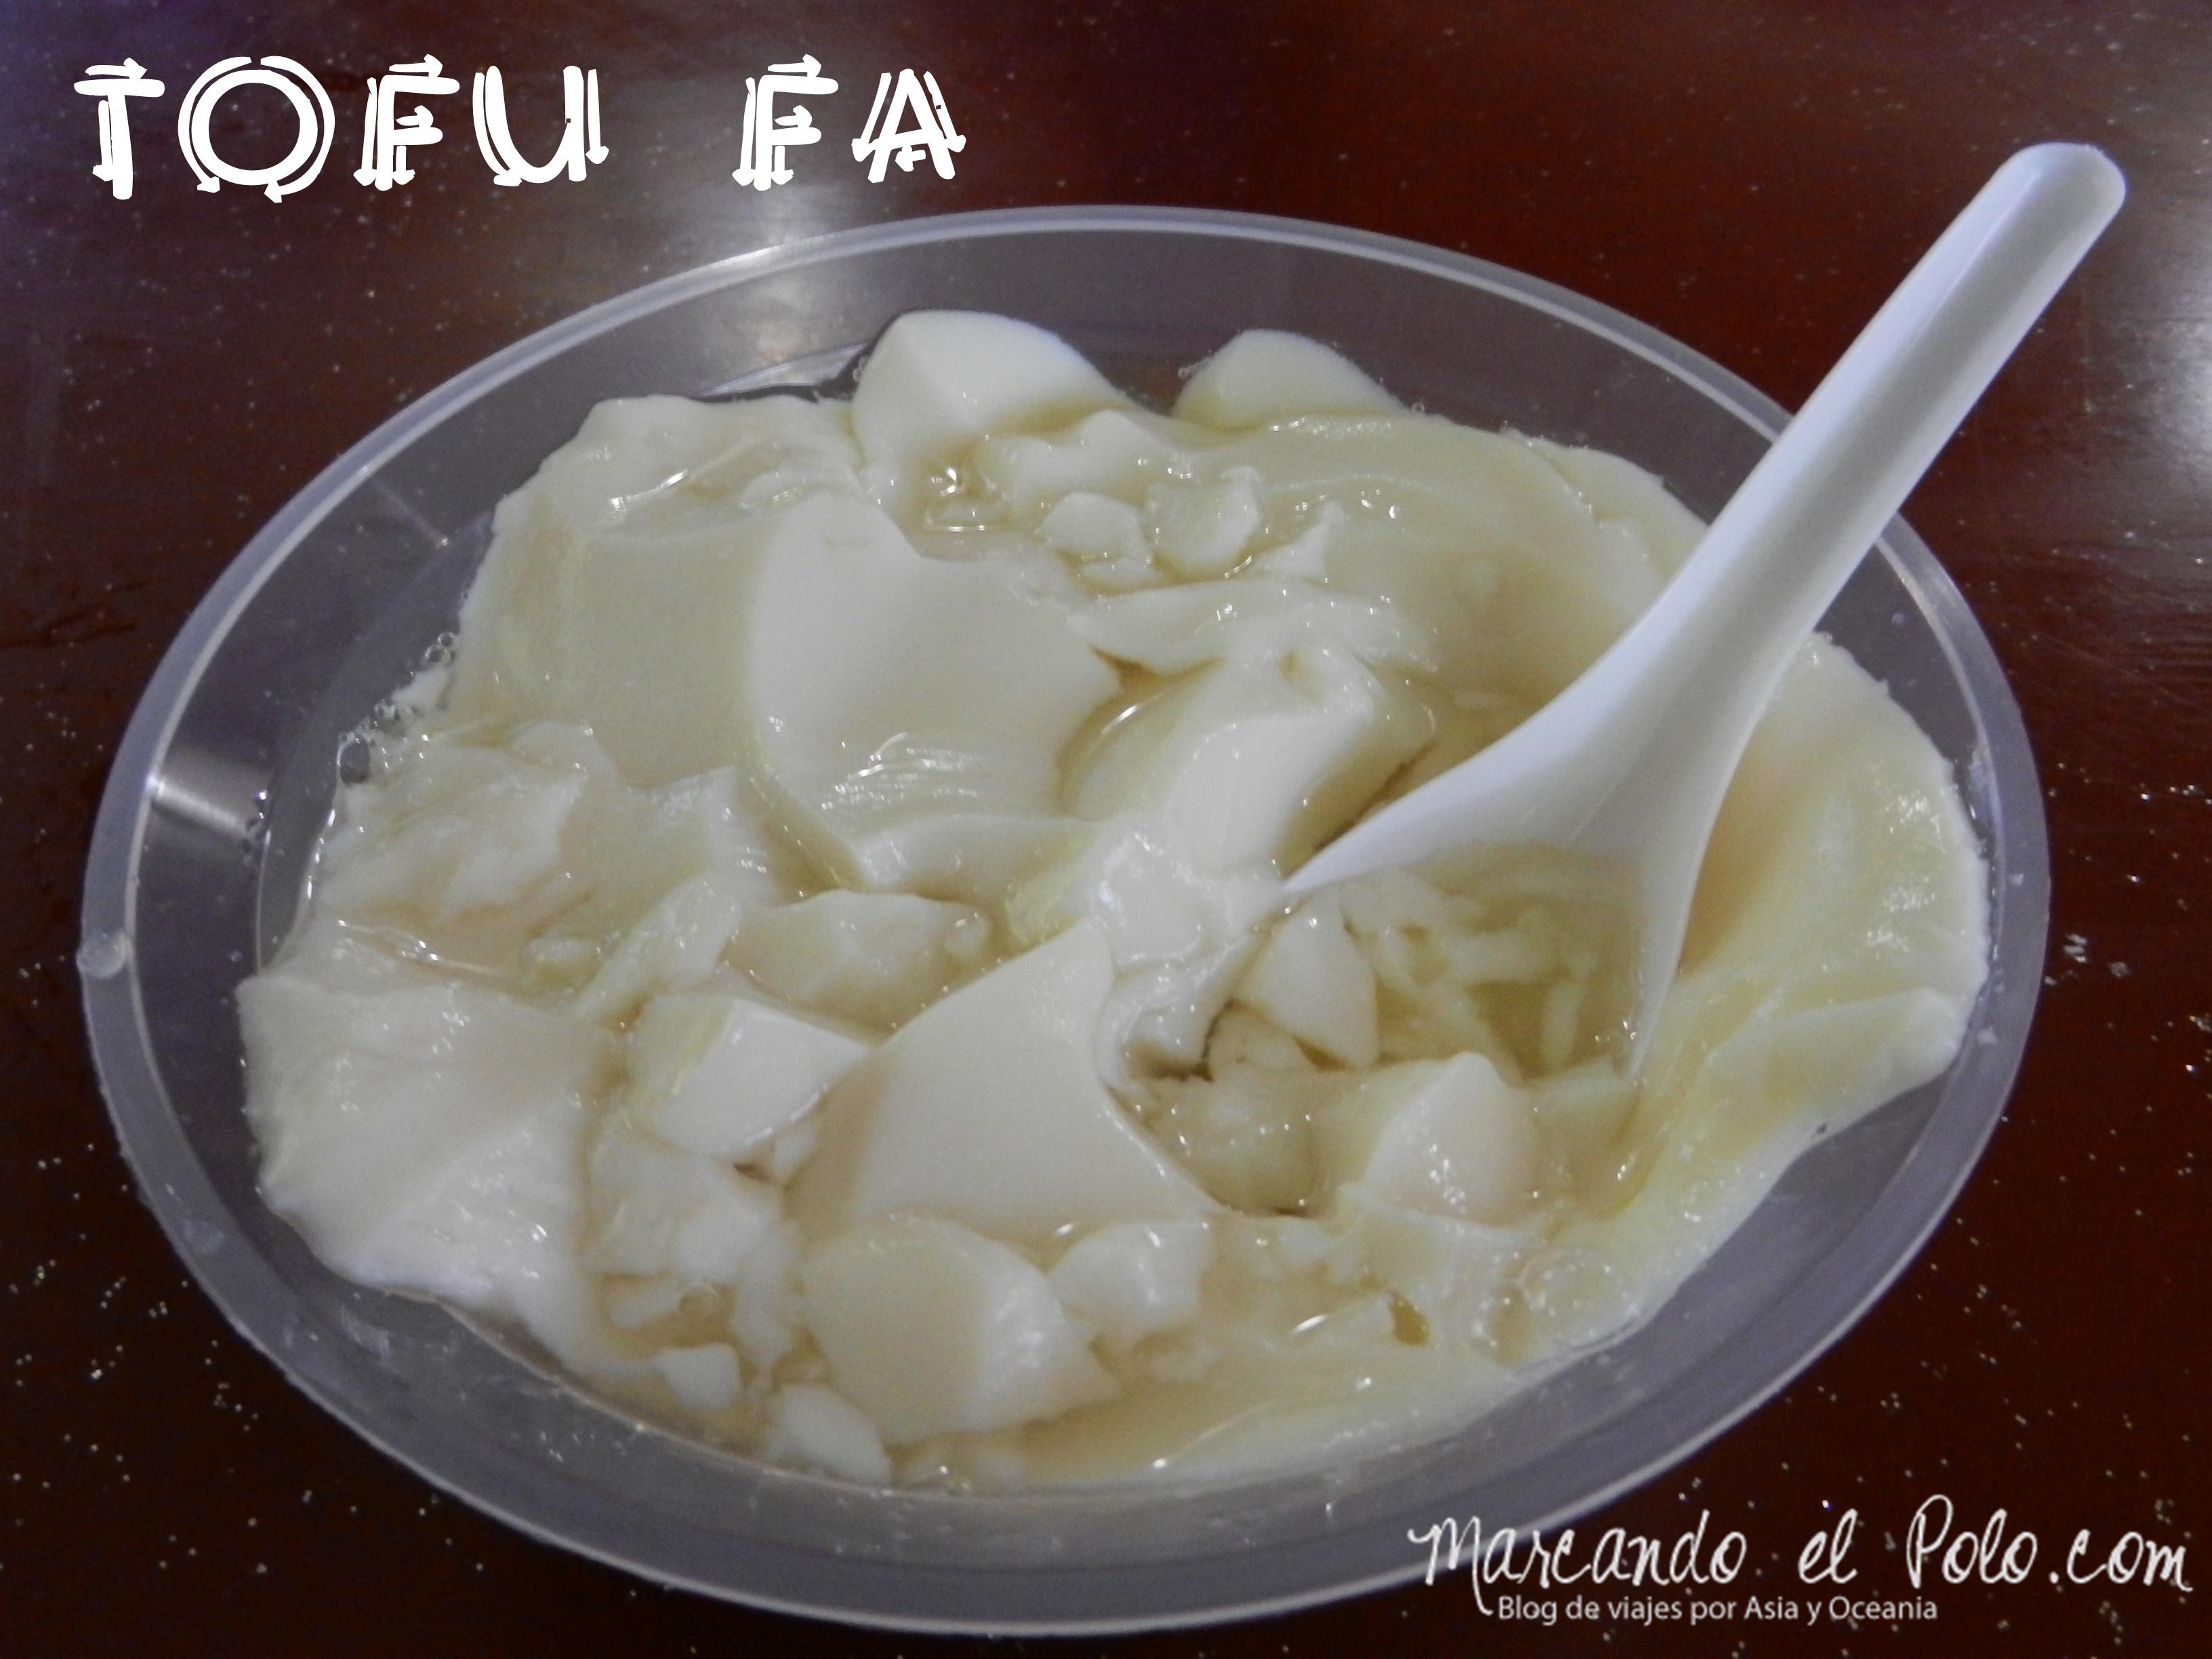 Tofu fa en Singapur